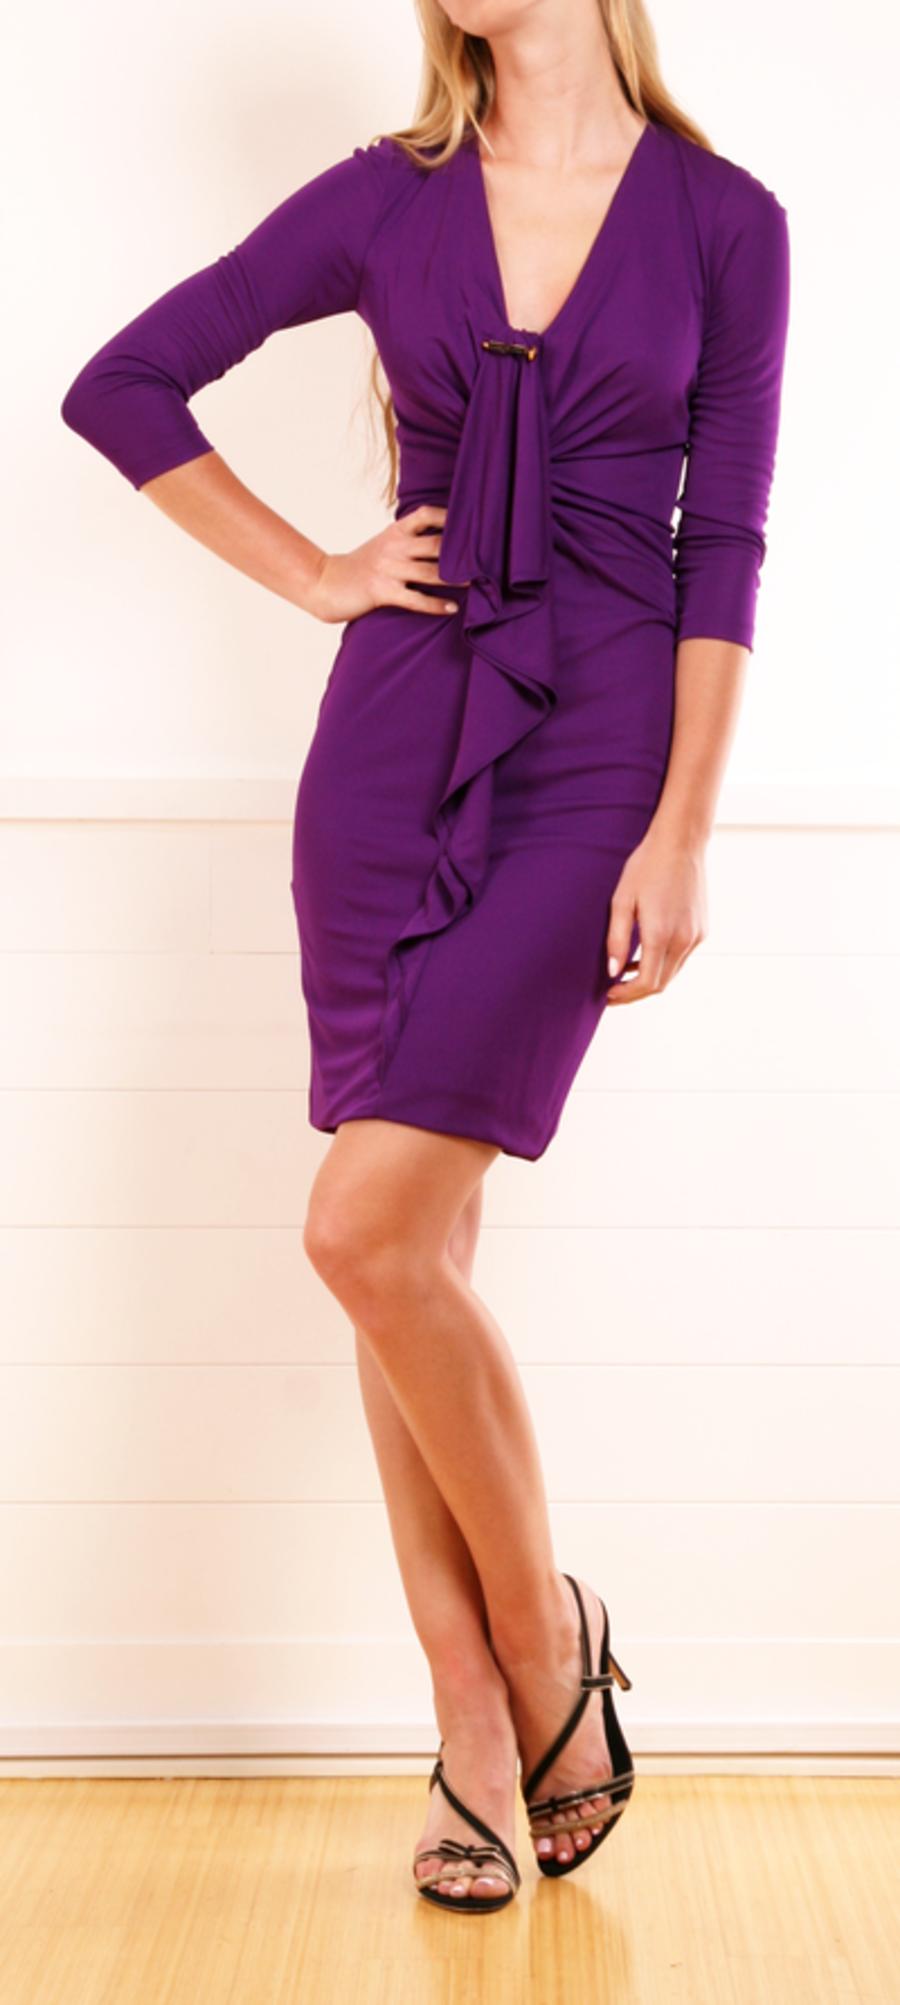 GUCCI DRESS @Michelle Flynn Flynn Coleman-HERS | VESTIDOS ...